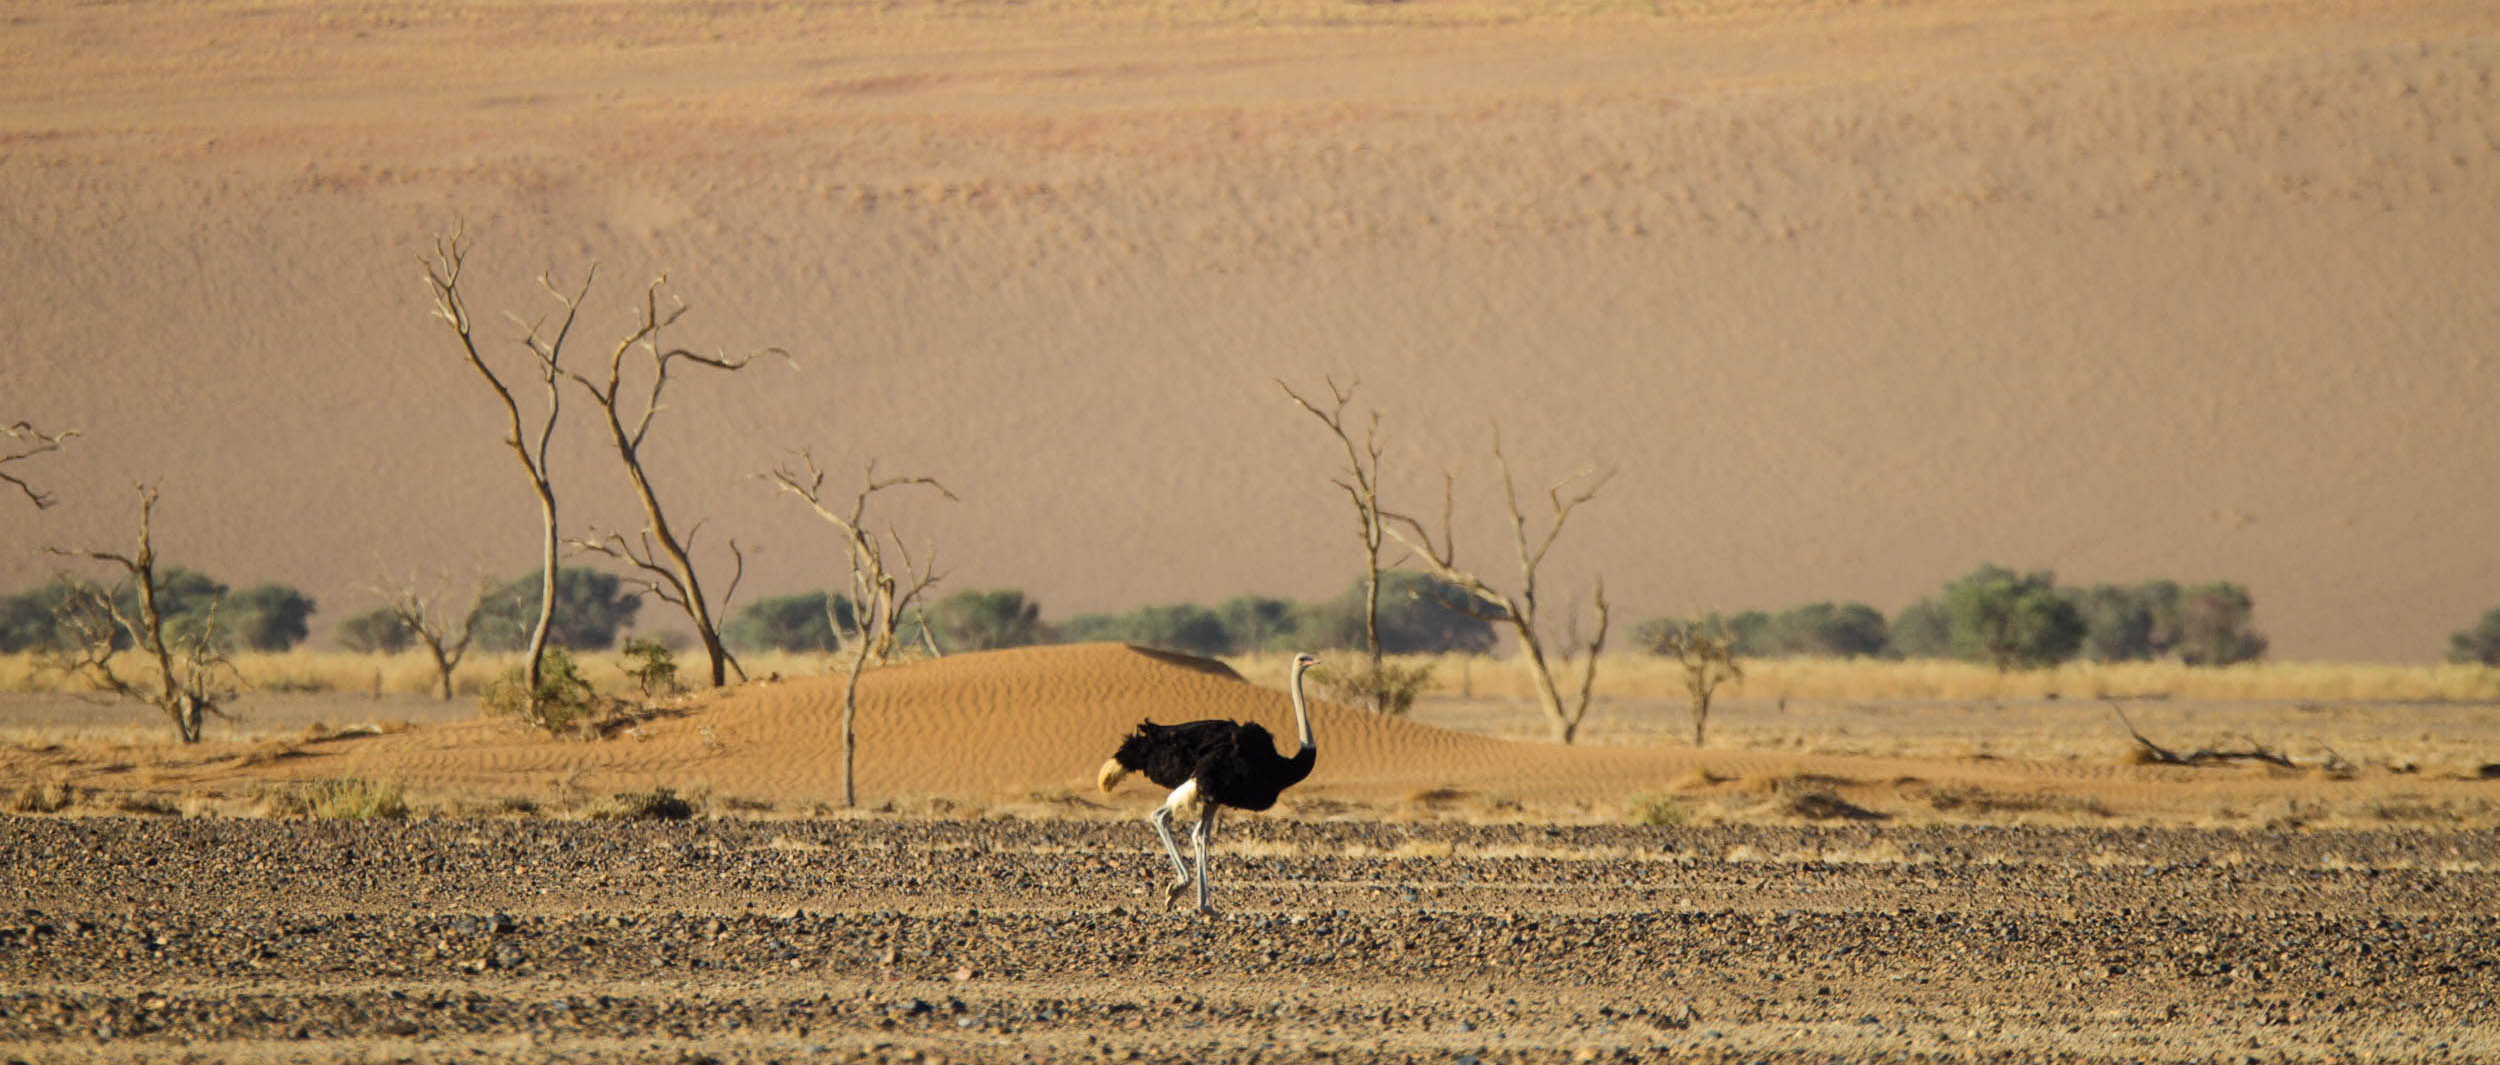 Namibie-2500px-05-IMG_0818-PANO